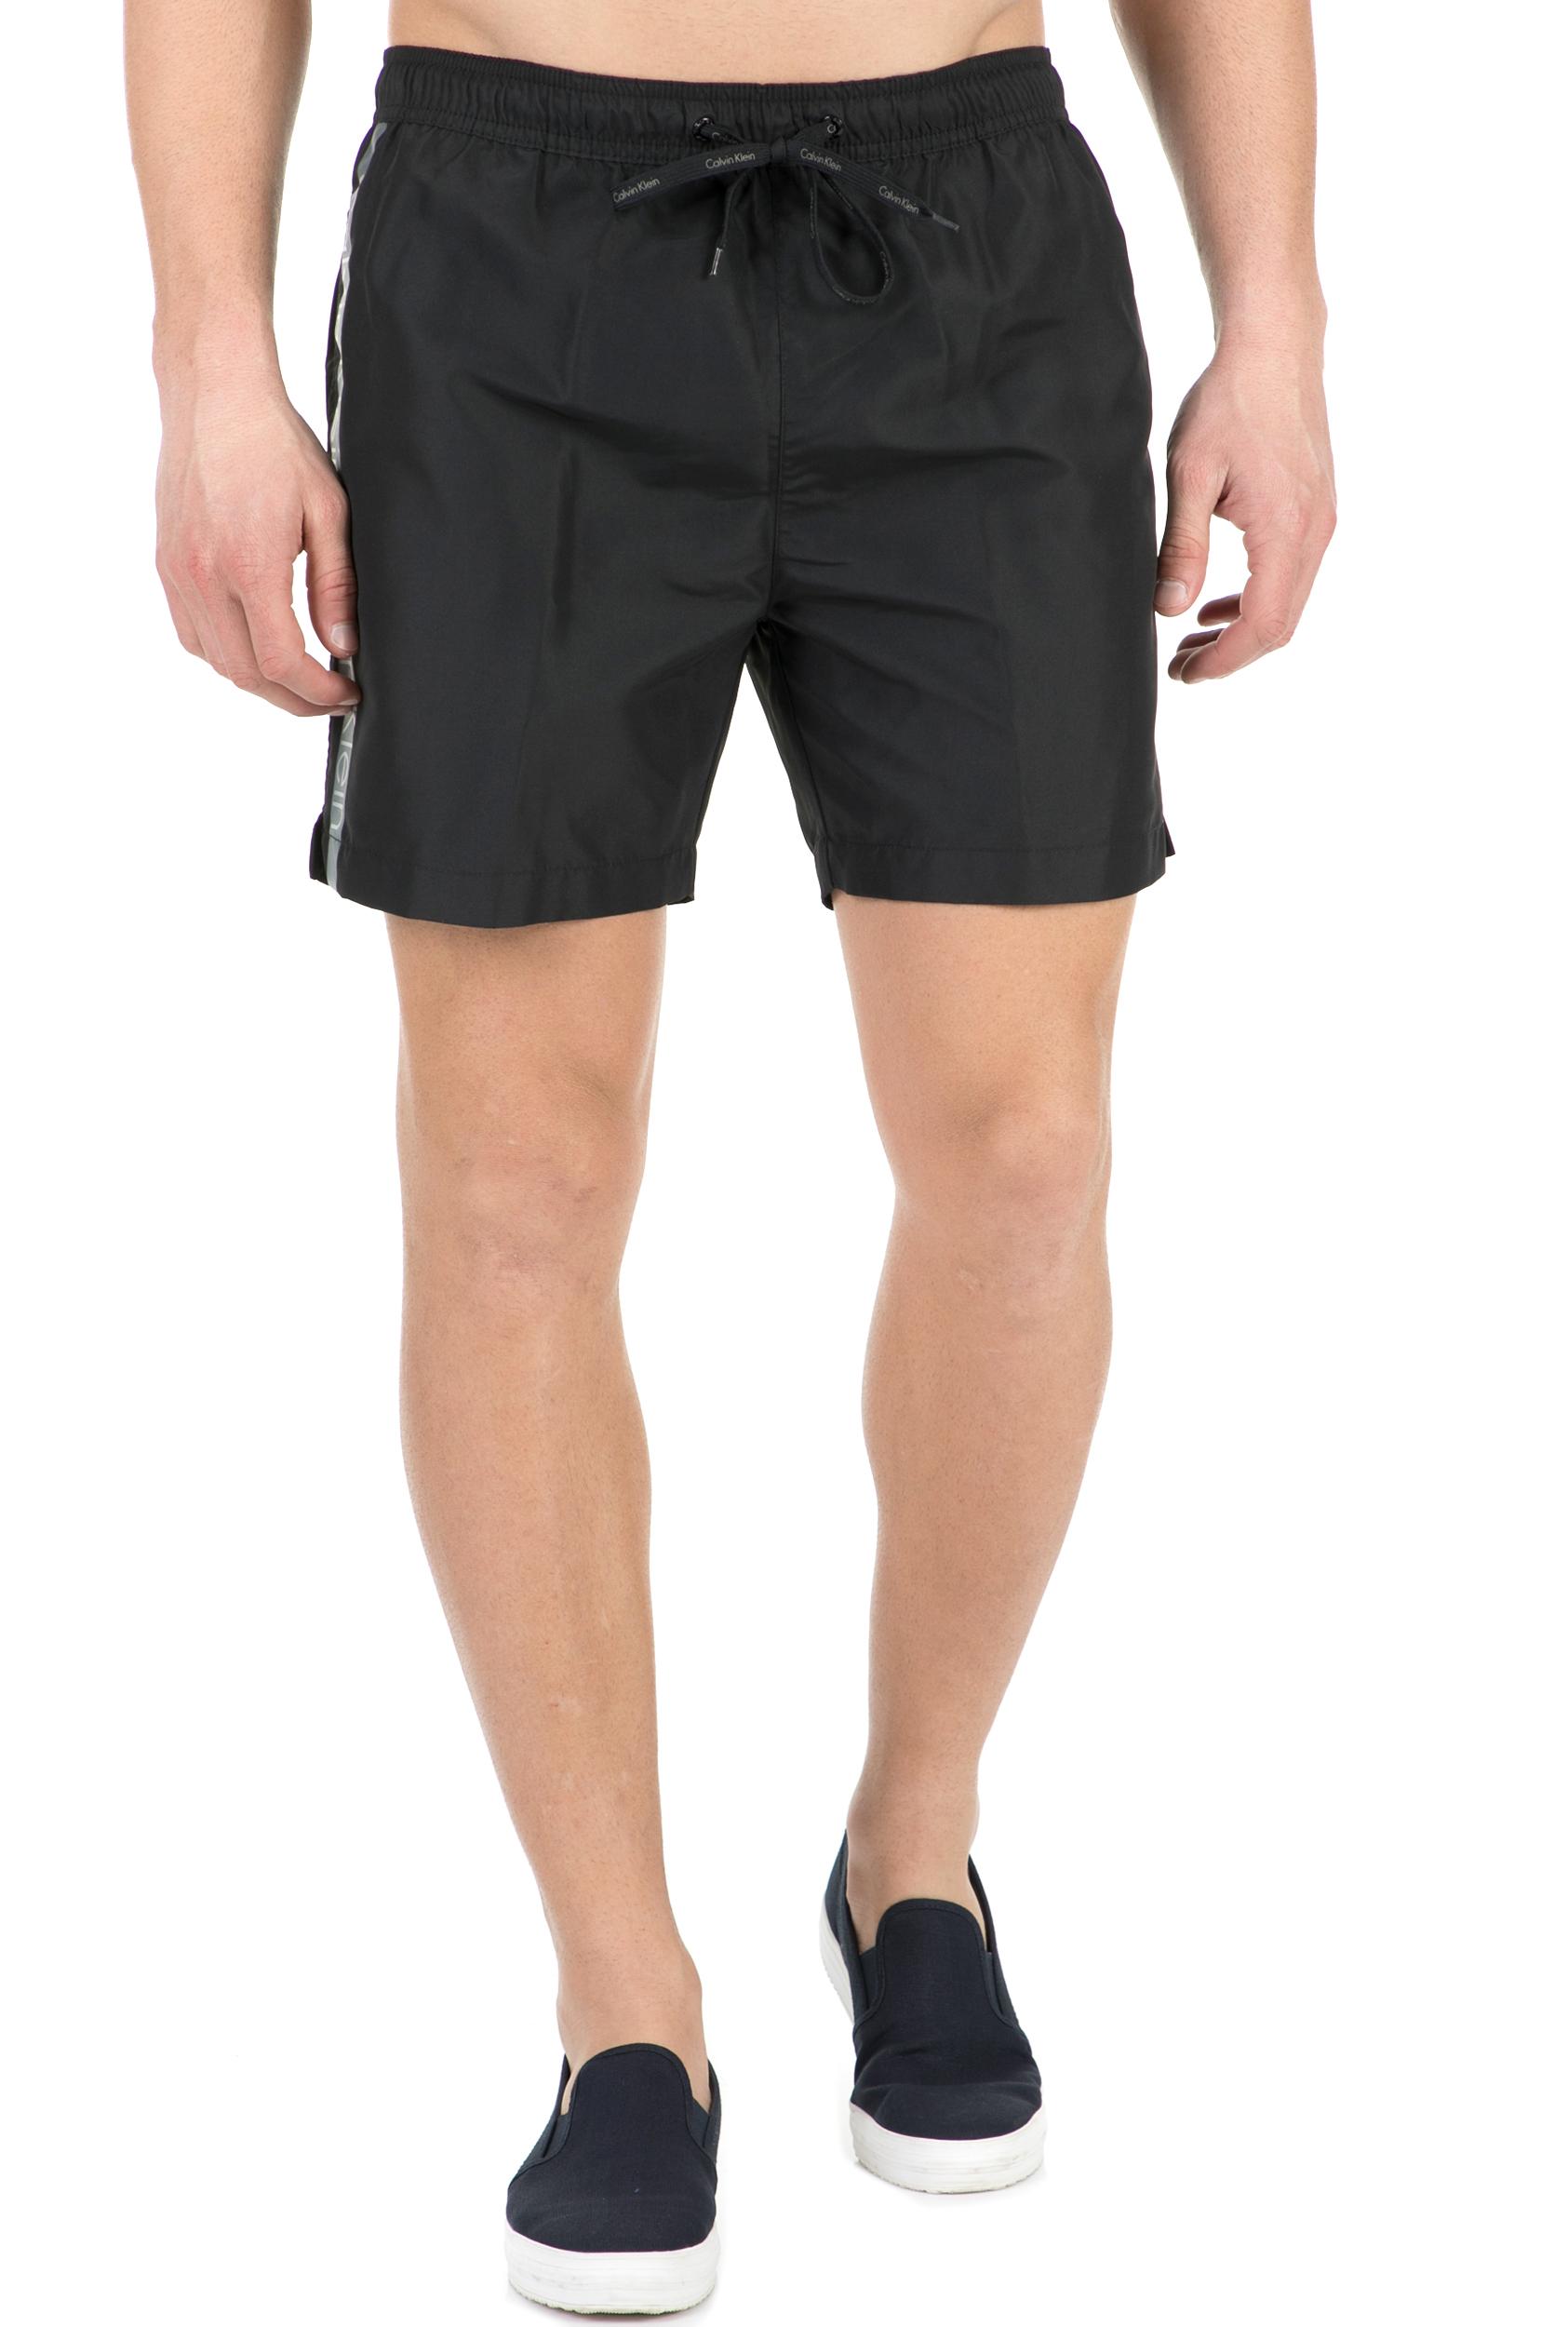 3161c17aa78 CK UNDERWEAR - Ανδρικό μαγιό σορτς CK Underwear MEDIUM DRAWSTRING μαύρο